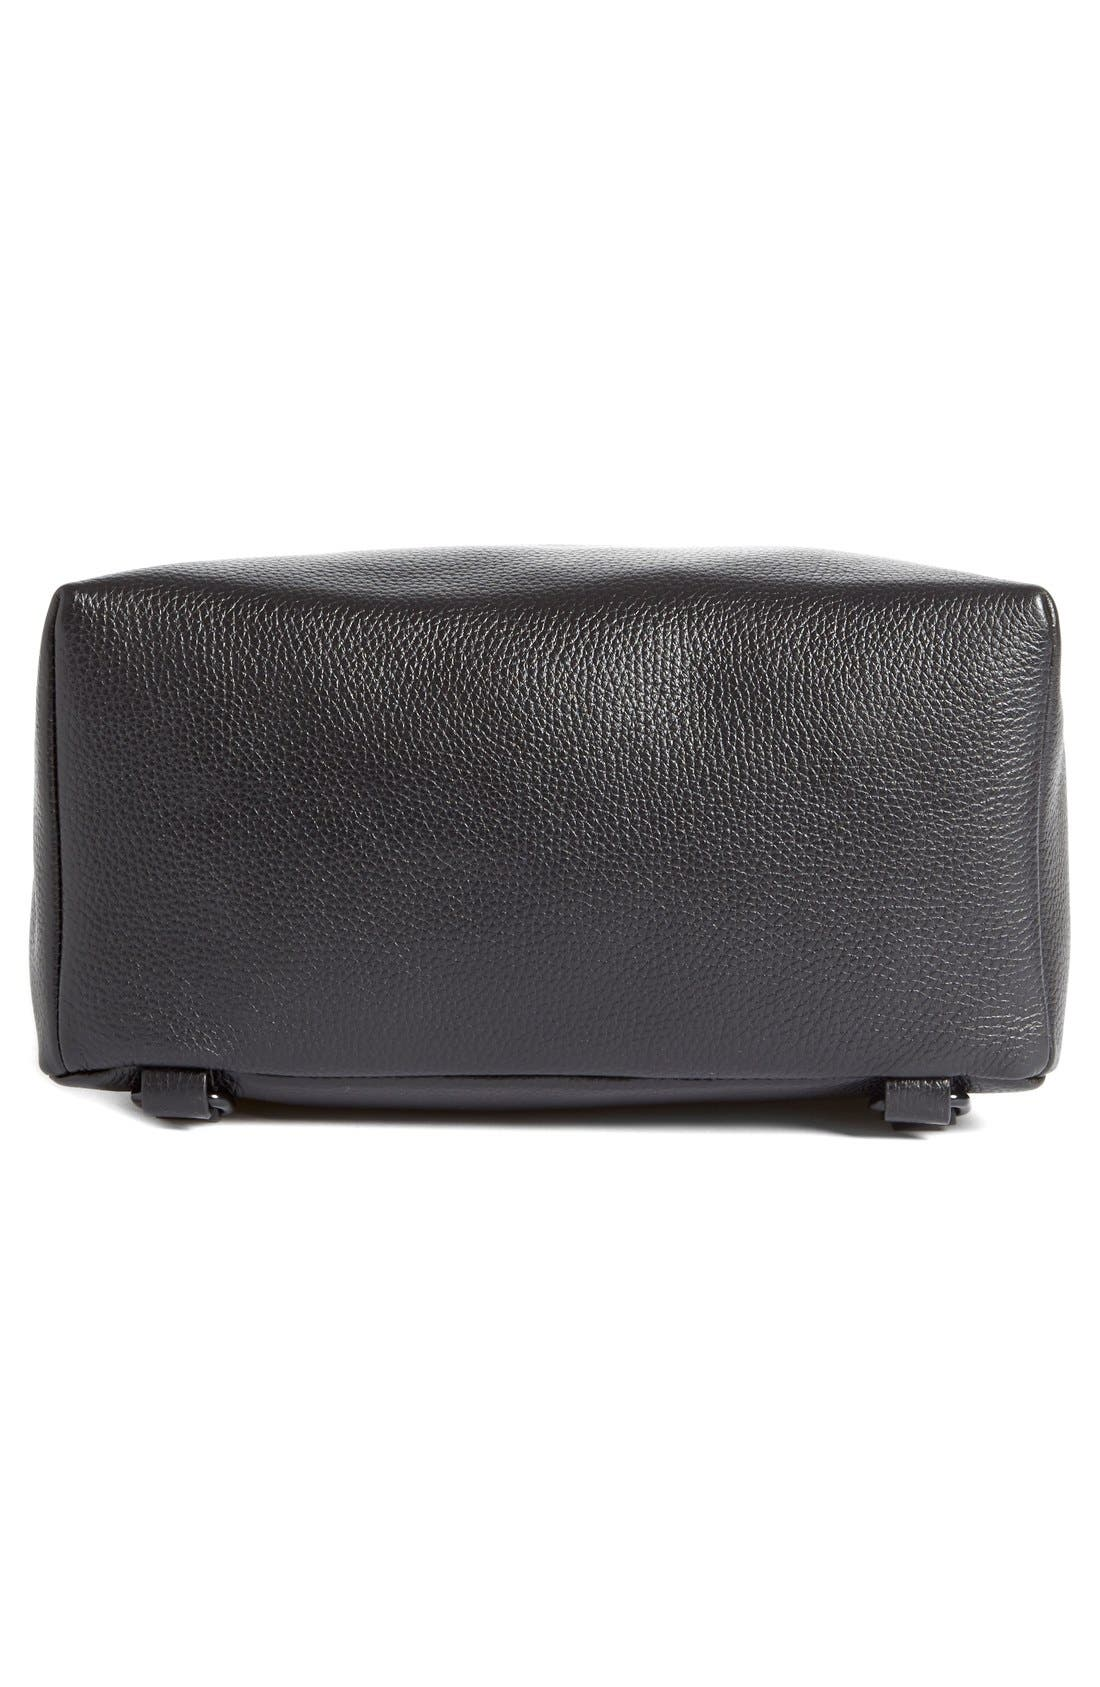 Leather Backpack,                             Alternate thumbnail 10, color,                             BLACK